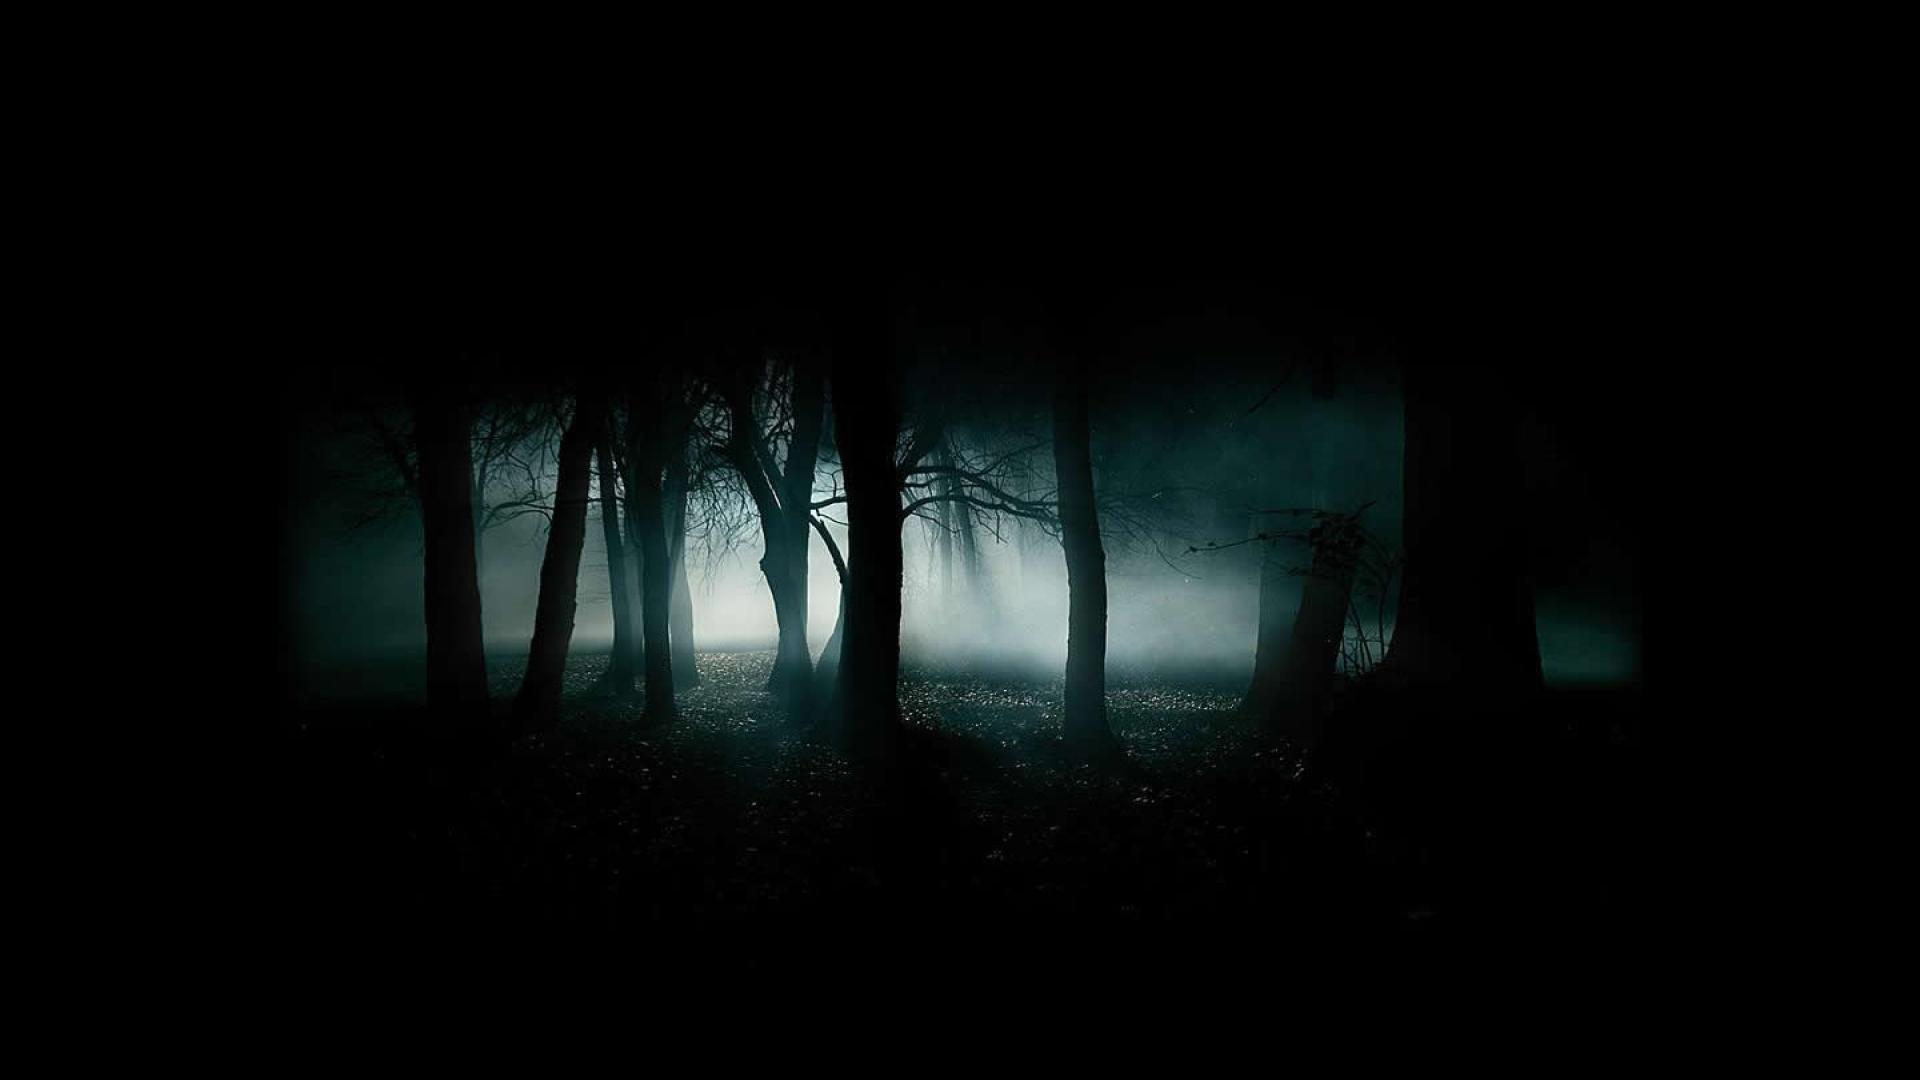 1920x1080 download scary dark forest kostenlos wallpaper 1920x1080 hd